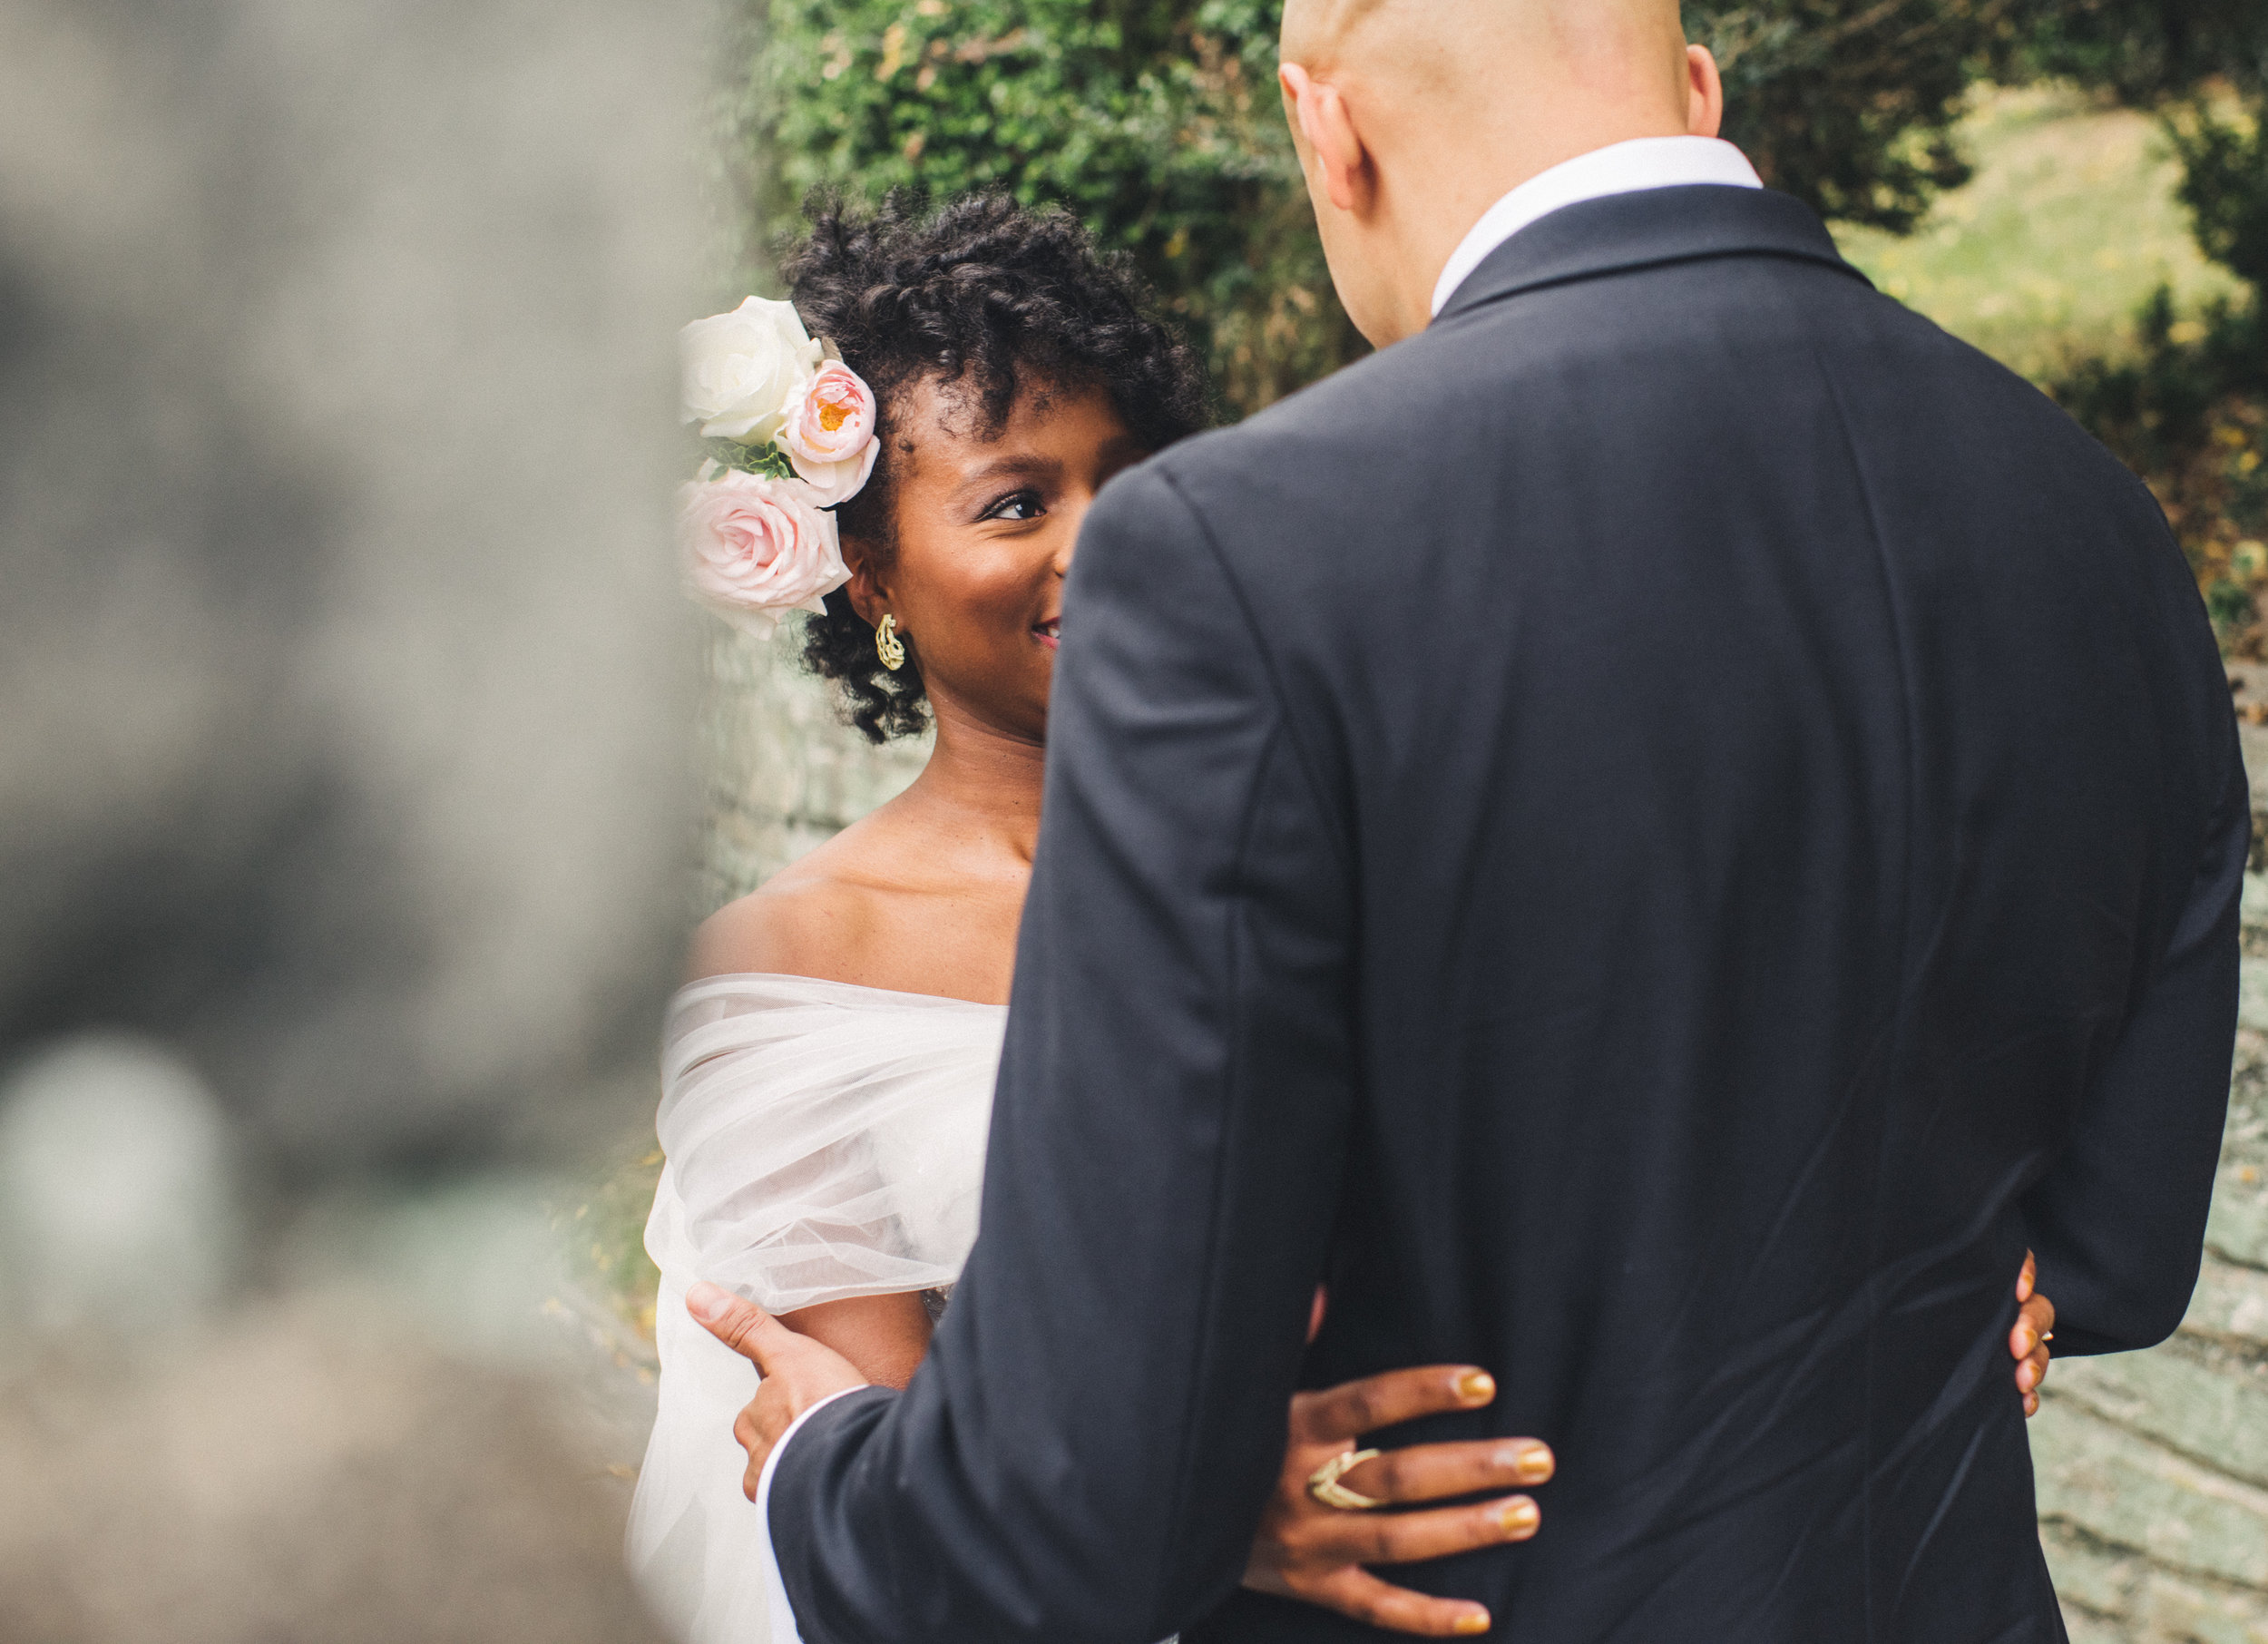 GLENVIEW MANSION WEDDING - INTIMATE WEDDING PHOTOGRAPHER - TWOTWENTY by CHI-CHI AGBIM-136.jpg